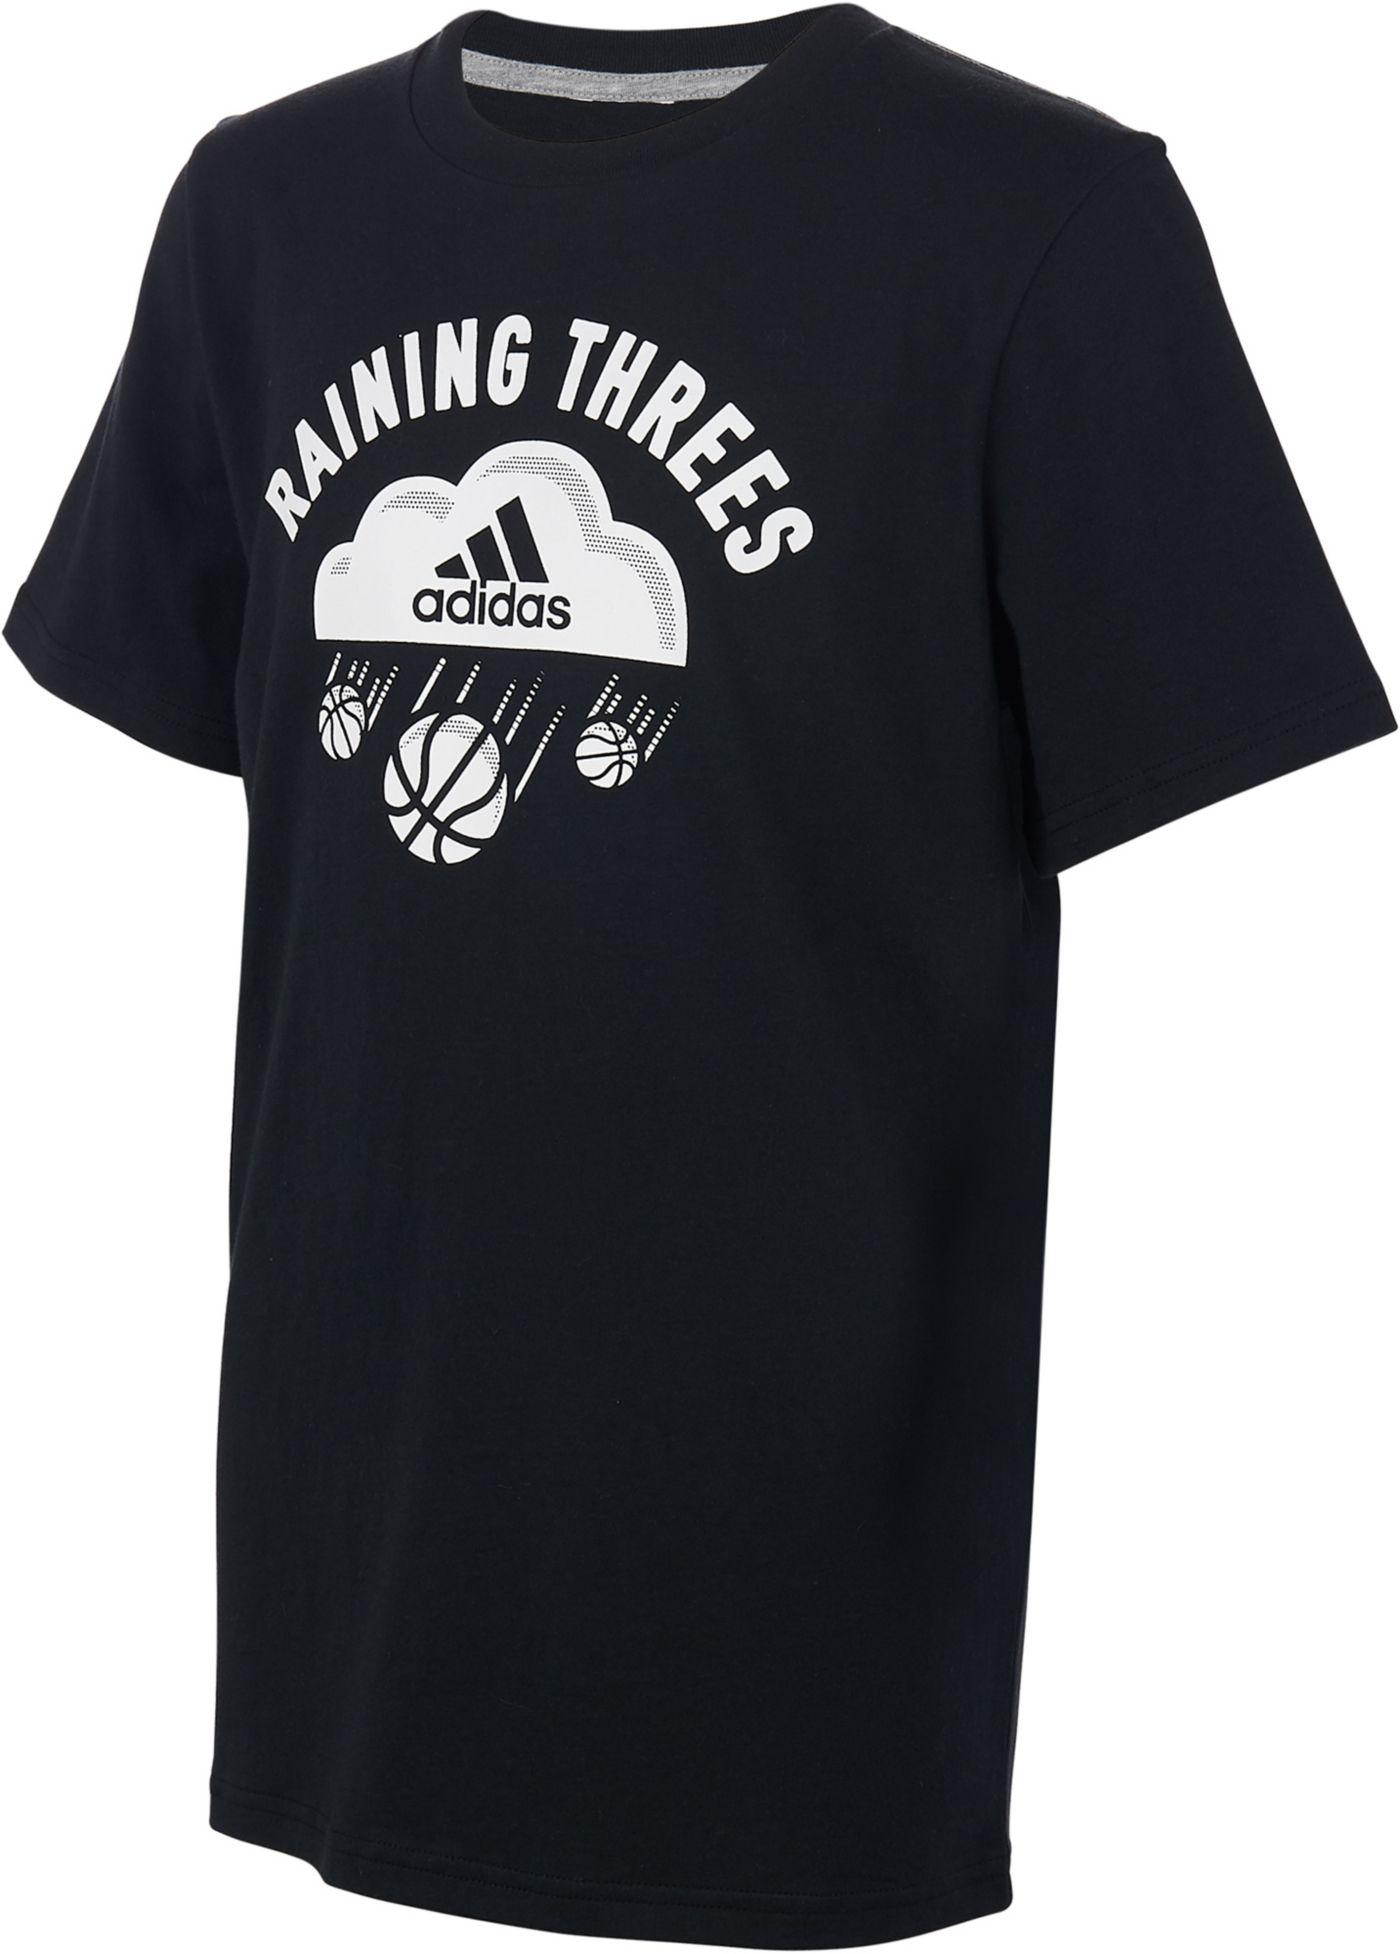 adidas Boys' Raining Three's Graphic T-Shirt